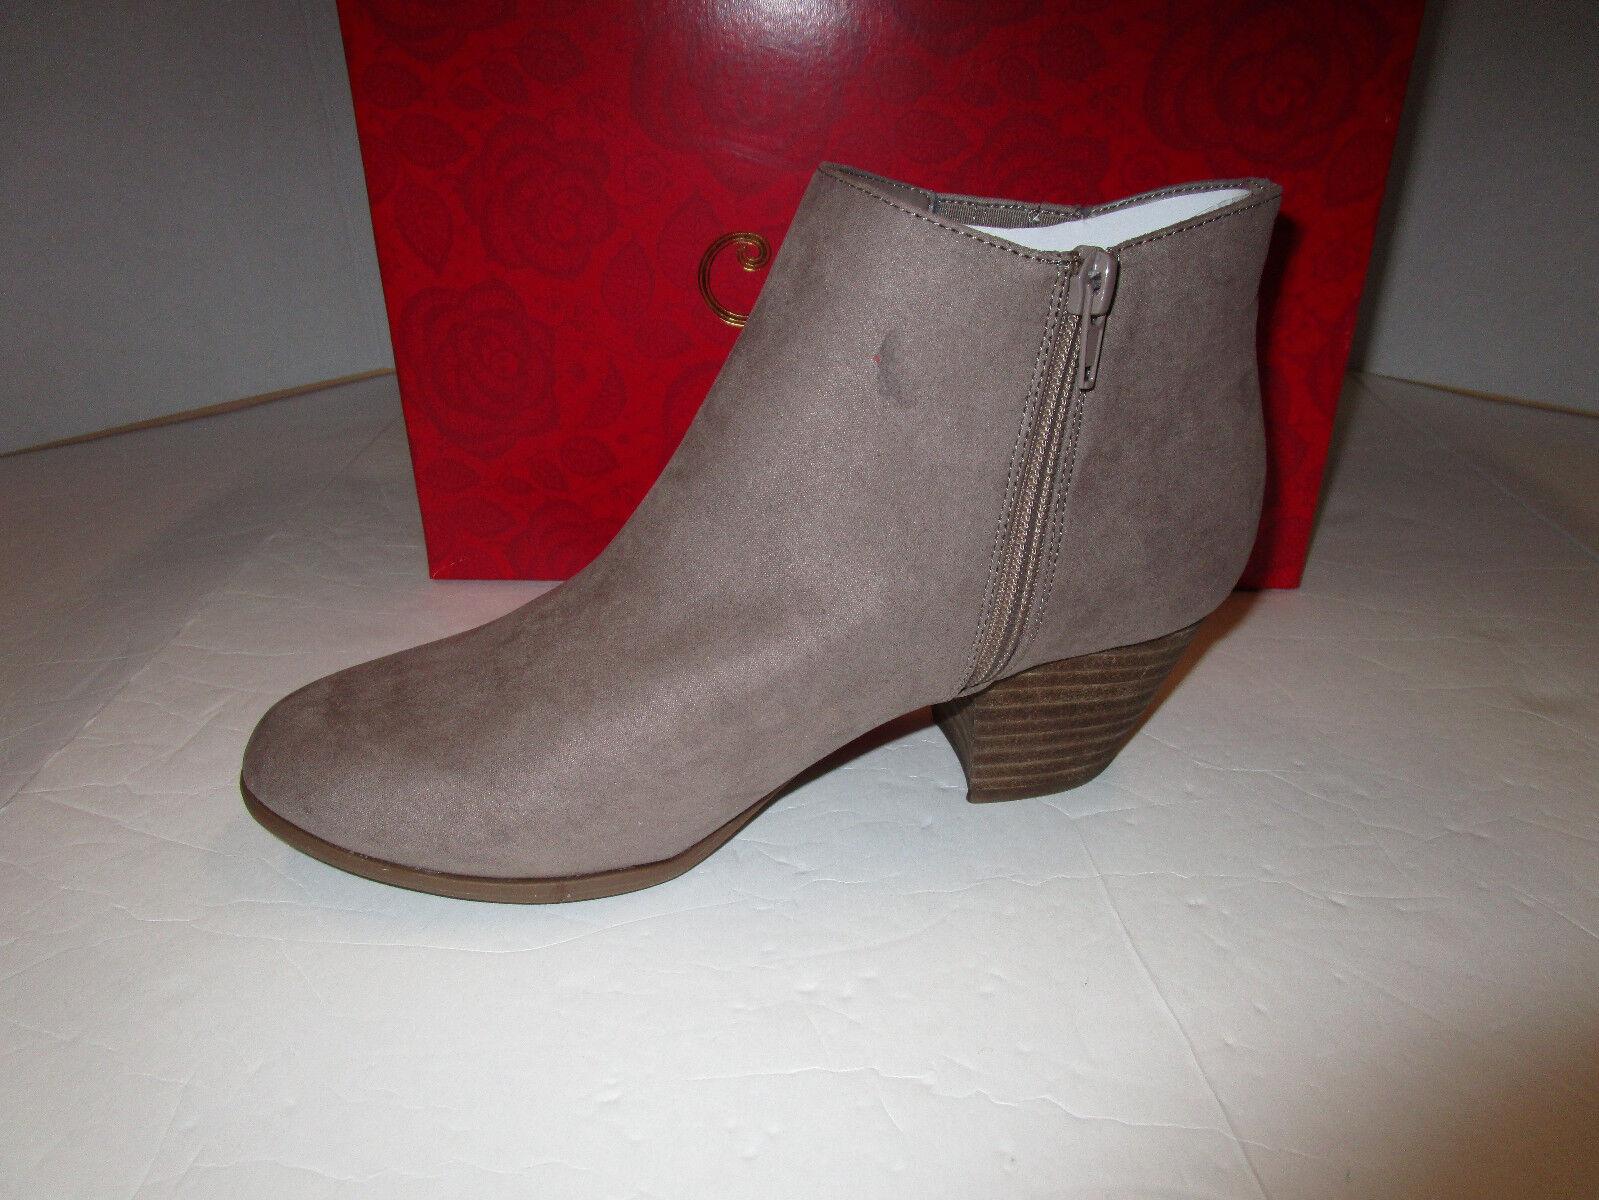 Nib Damenschuhe Carlos Santana Ankle Hazel Taupe Faux Suede Ankle Santana Stiefel Booties 9.5 5193b1